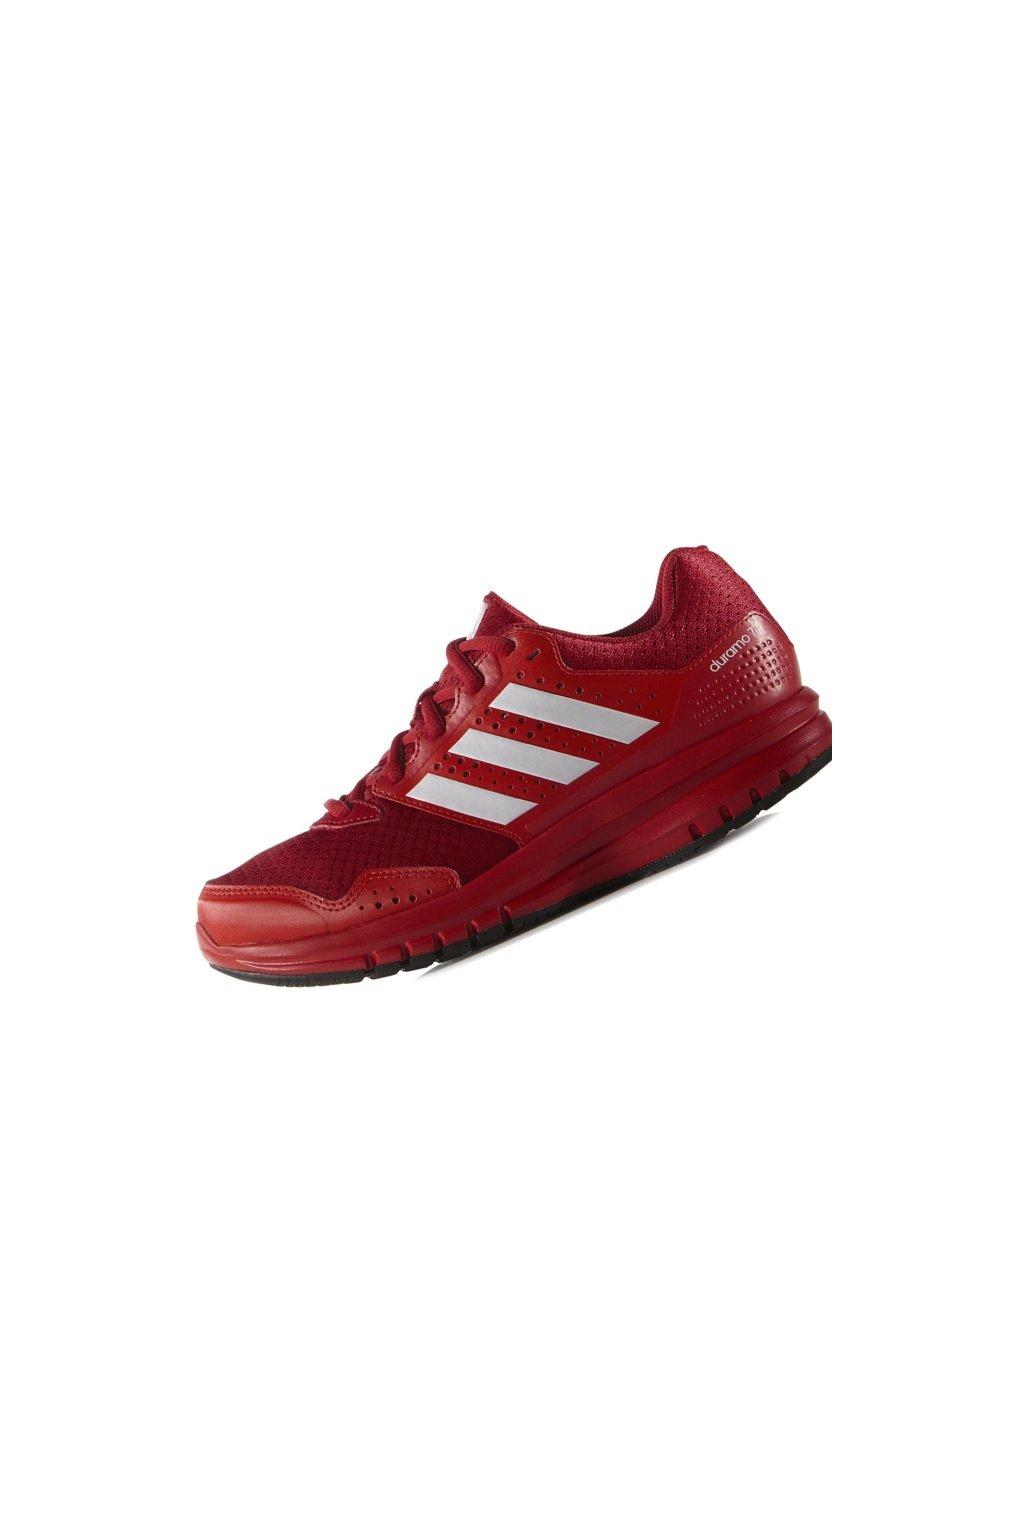 ca7be012c3cb2 Juniorská obuv Adidas Duramo 7 k - S42126 - Fresh sport